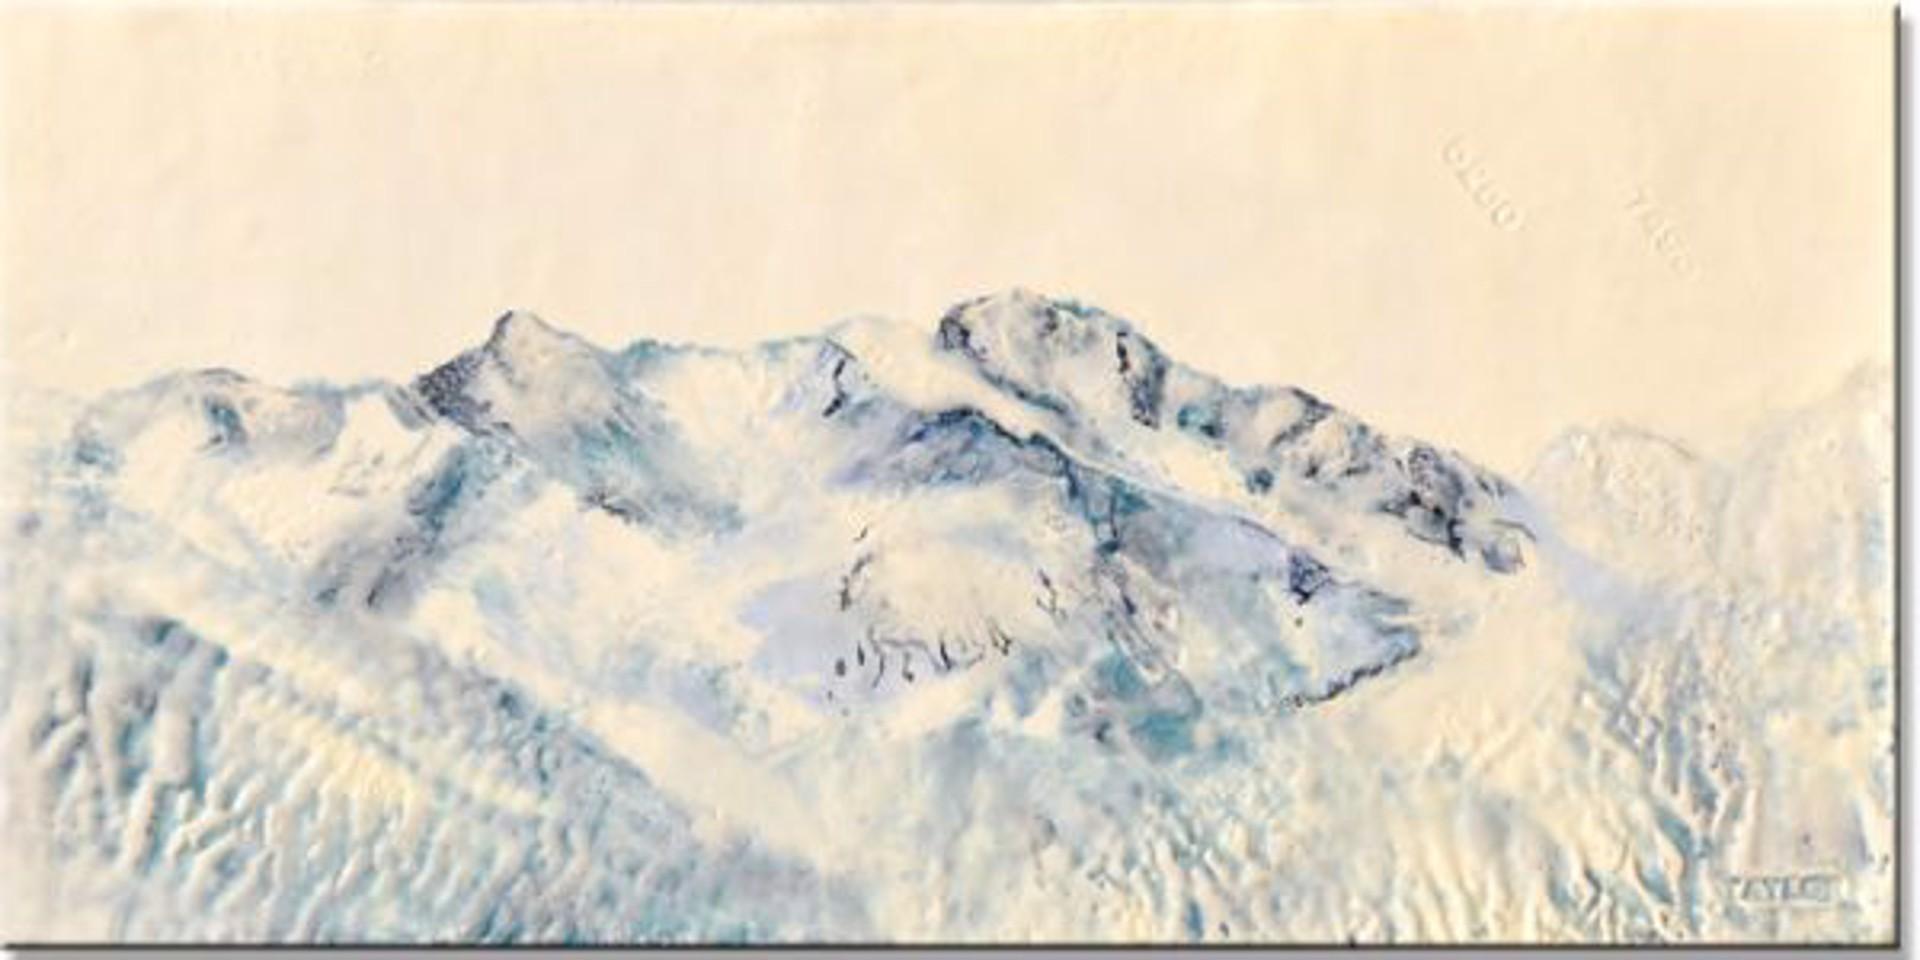 Ain't No Mountain High Enough II by MOE TAYLOR